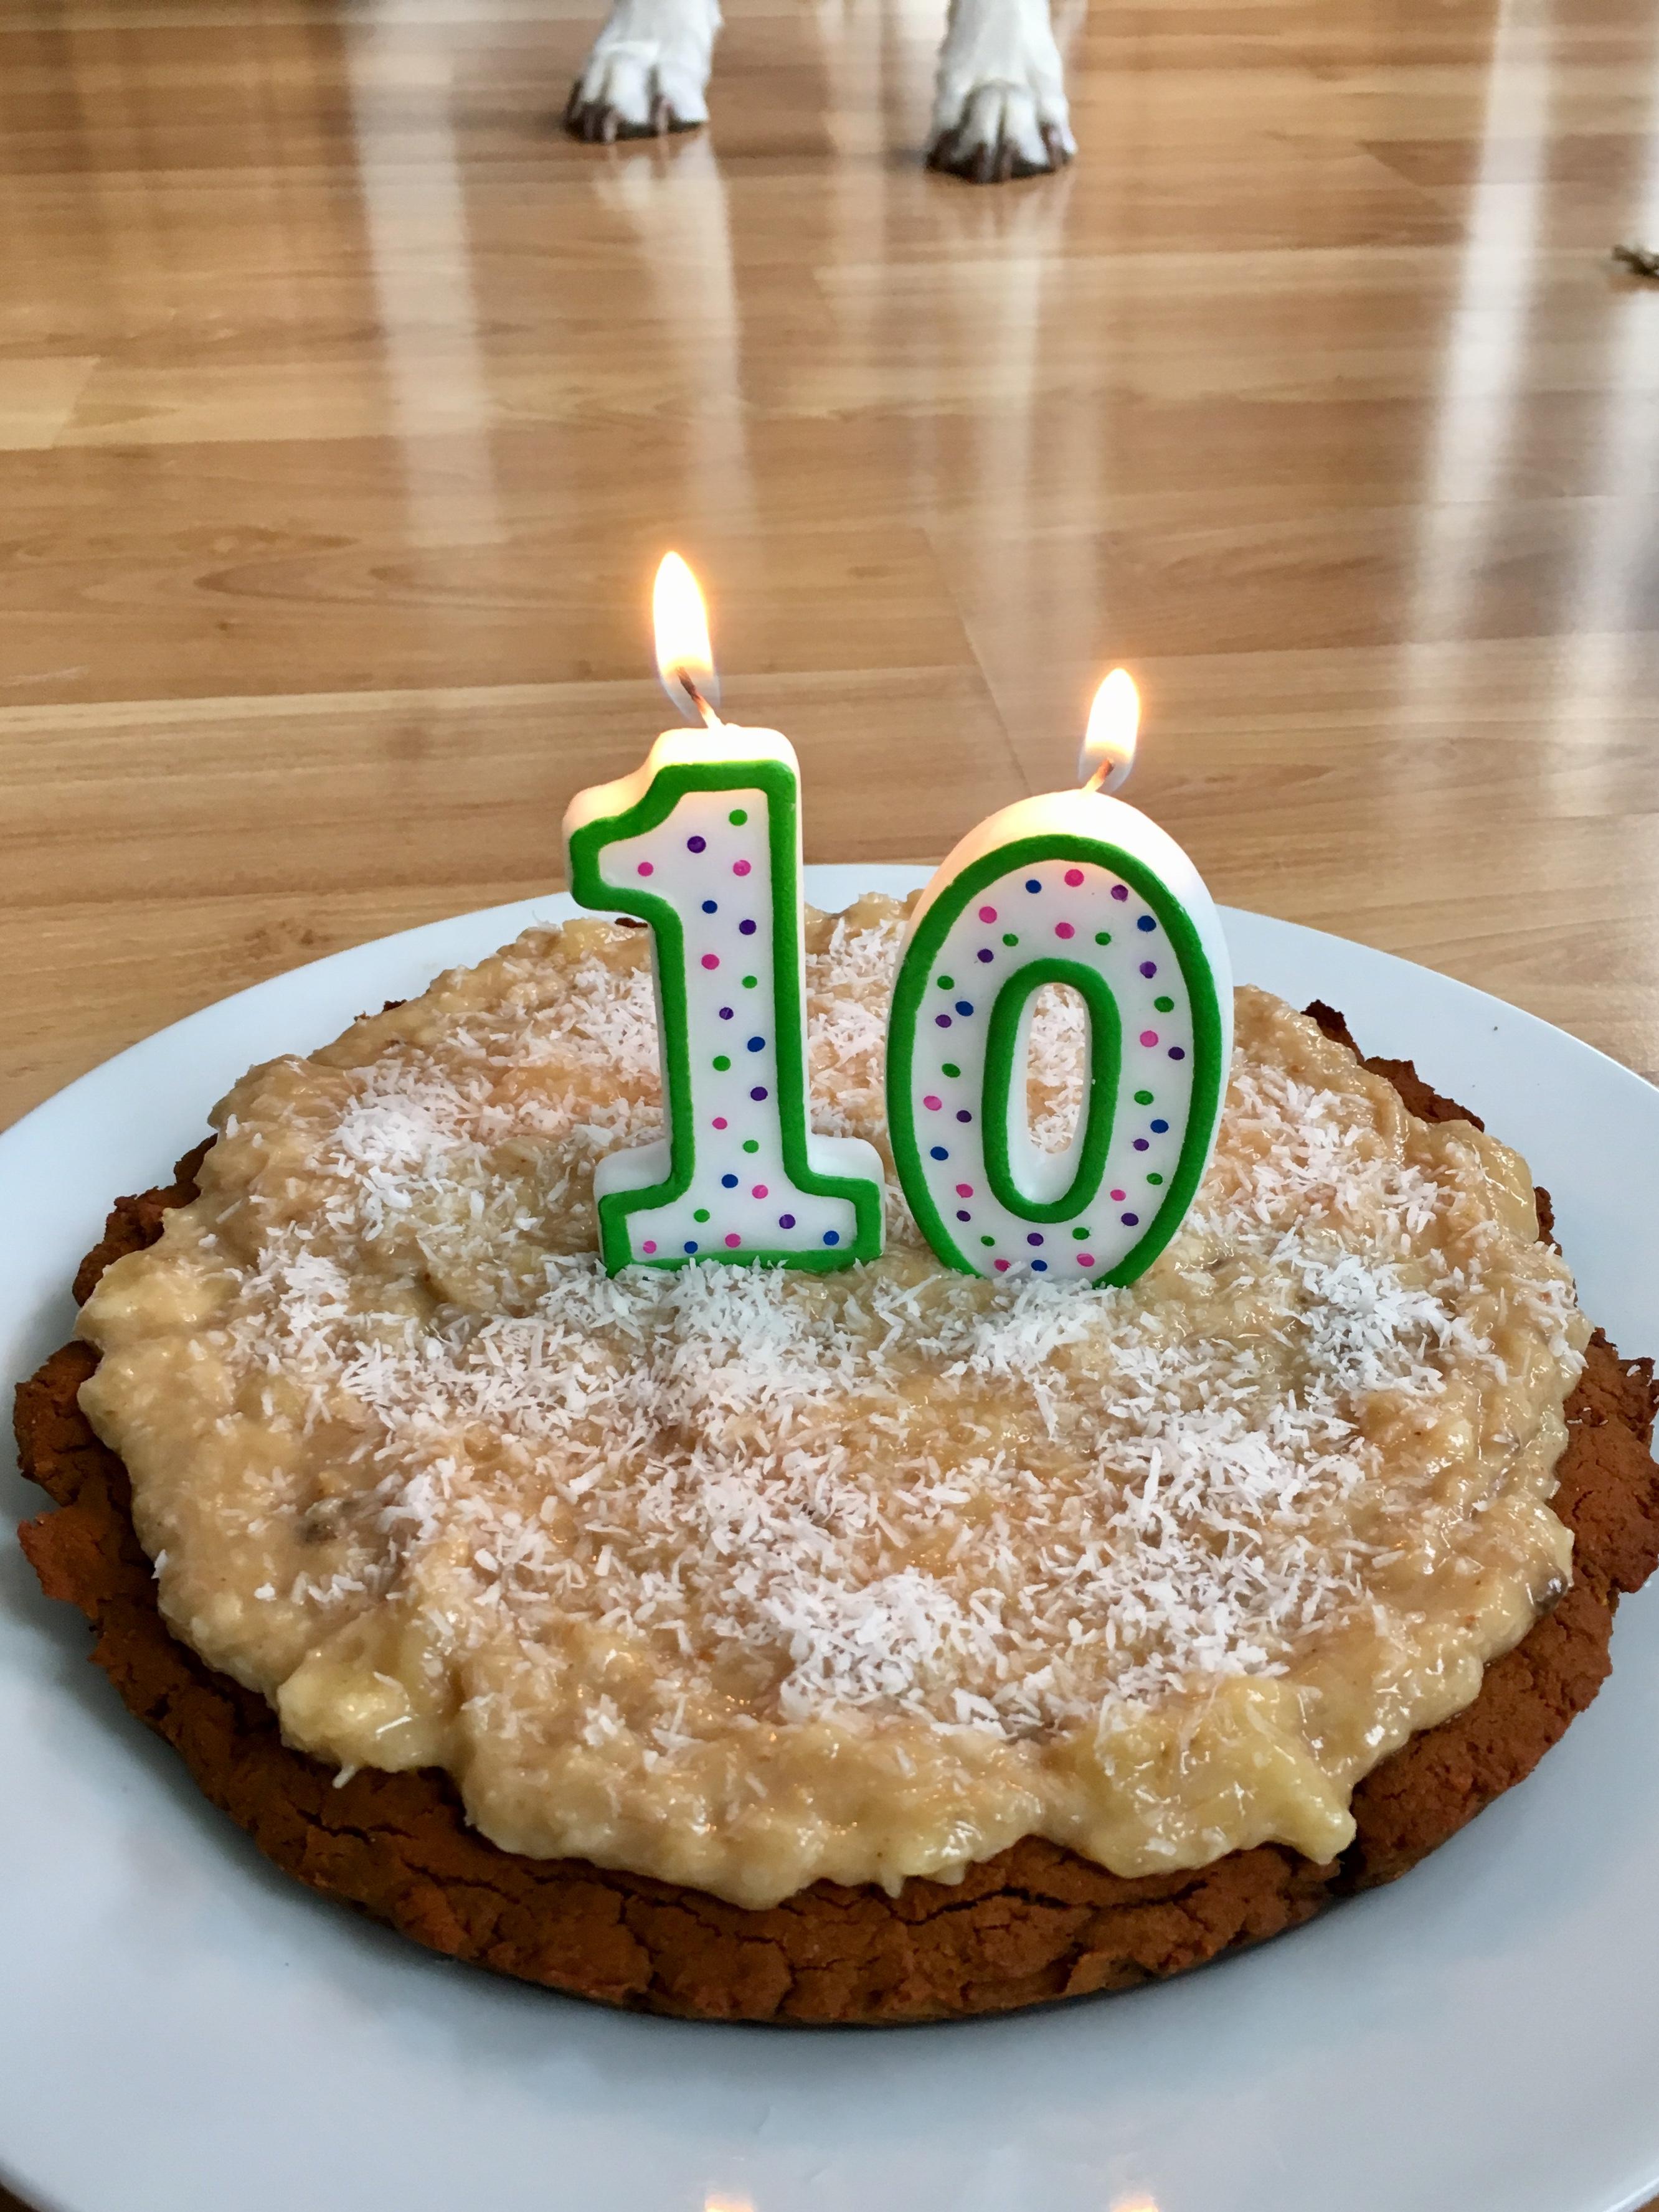 Dog Birthday Cake (gf) – The Sisters Kitchen